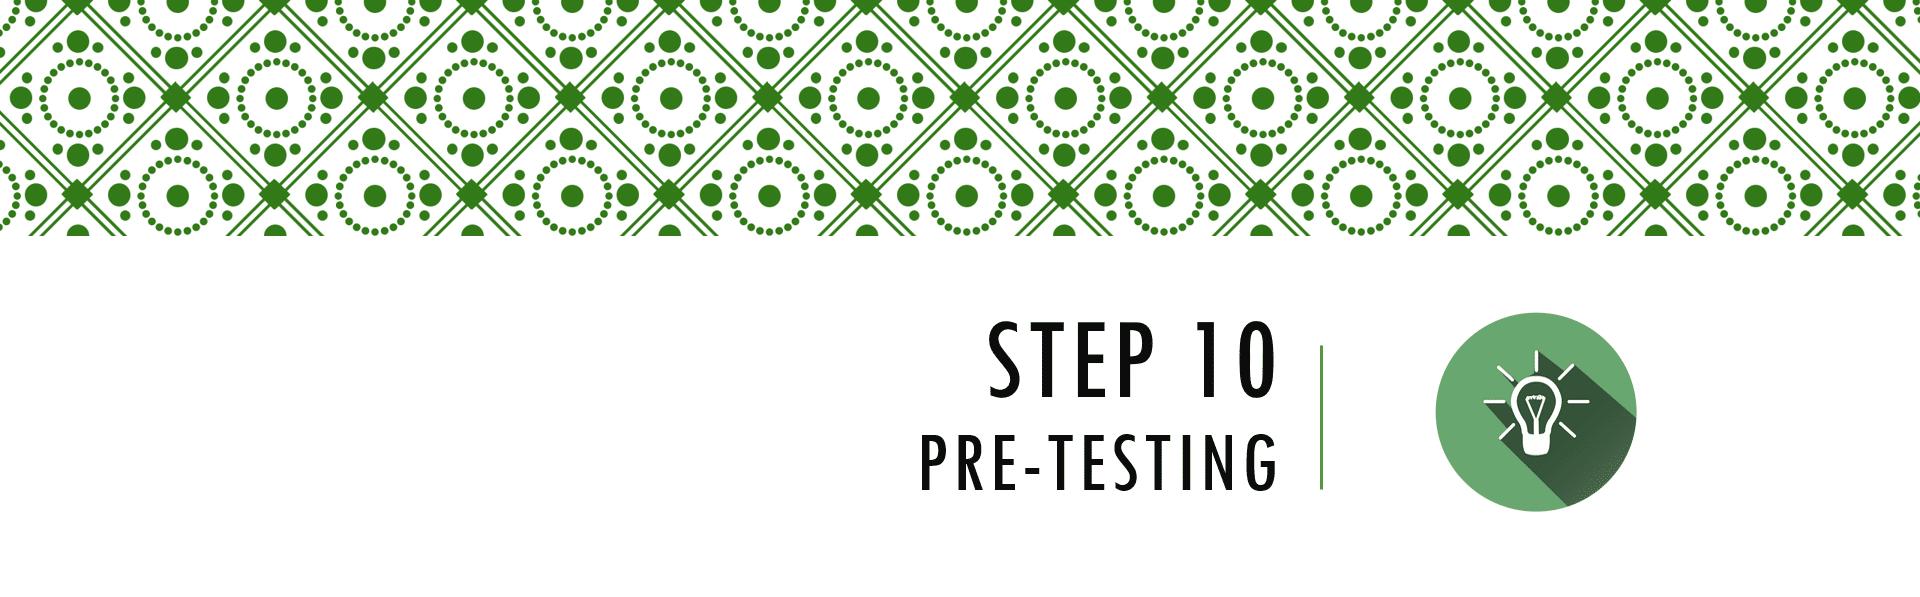 Questionnaire Design Process Step 10 - Pre-Testing